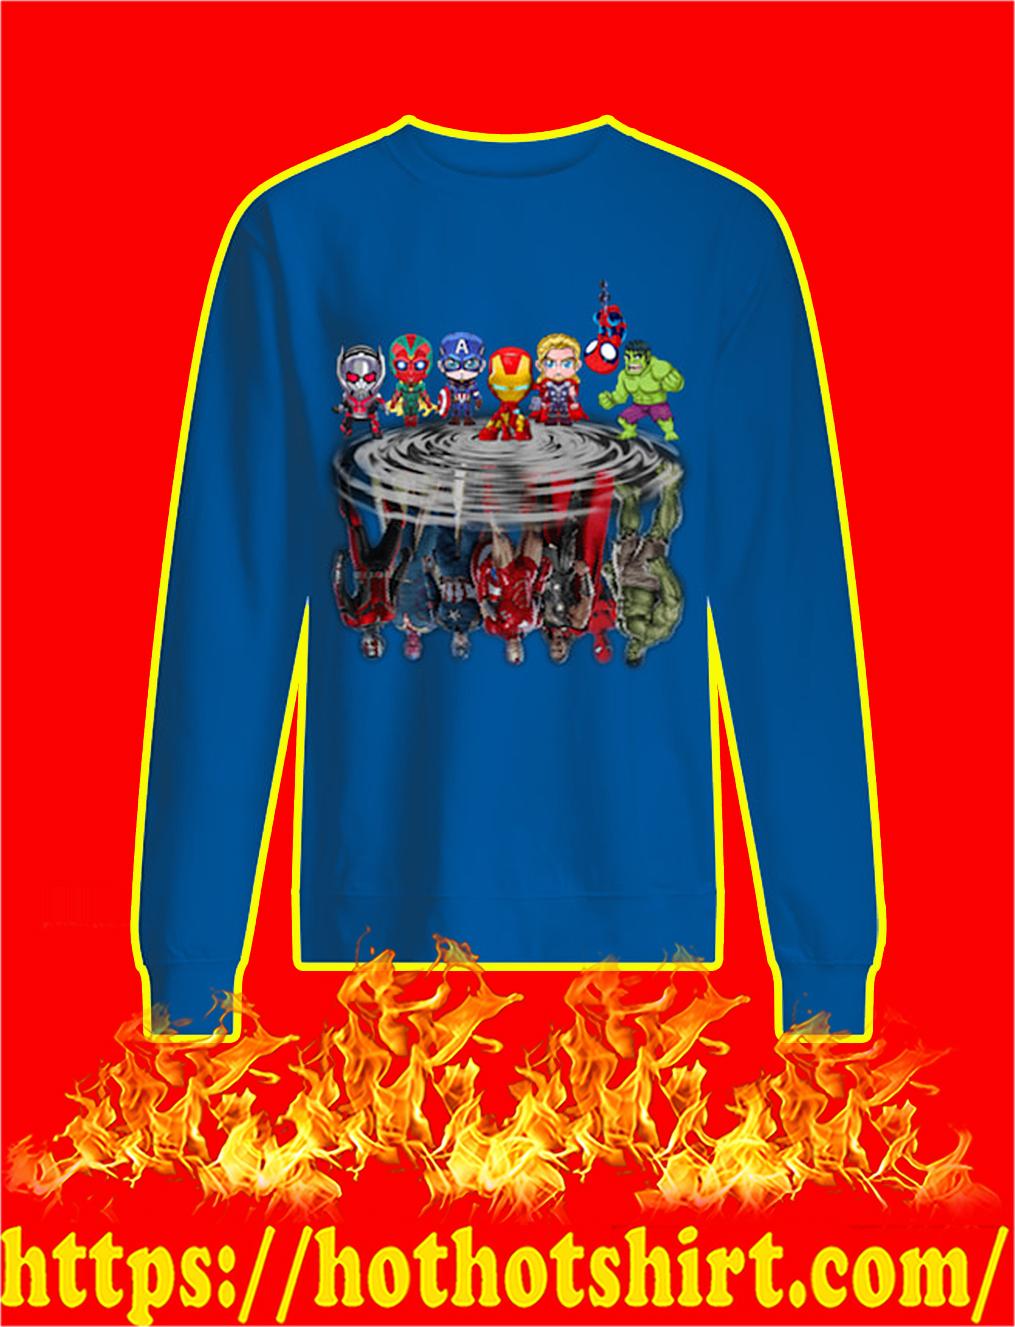 Chibi Avengers Reflection sweatshirt